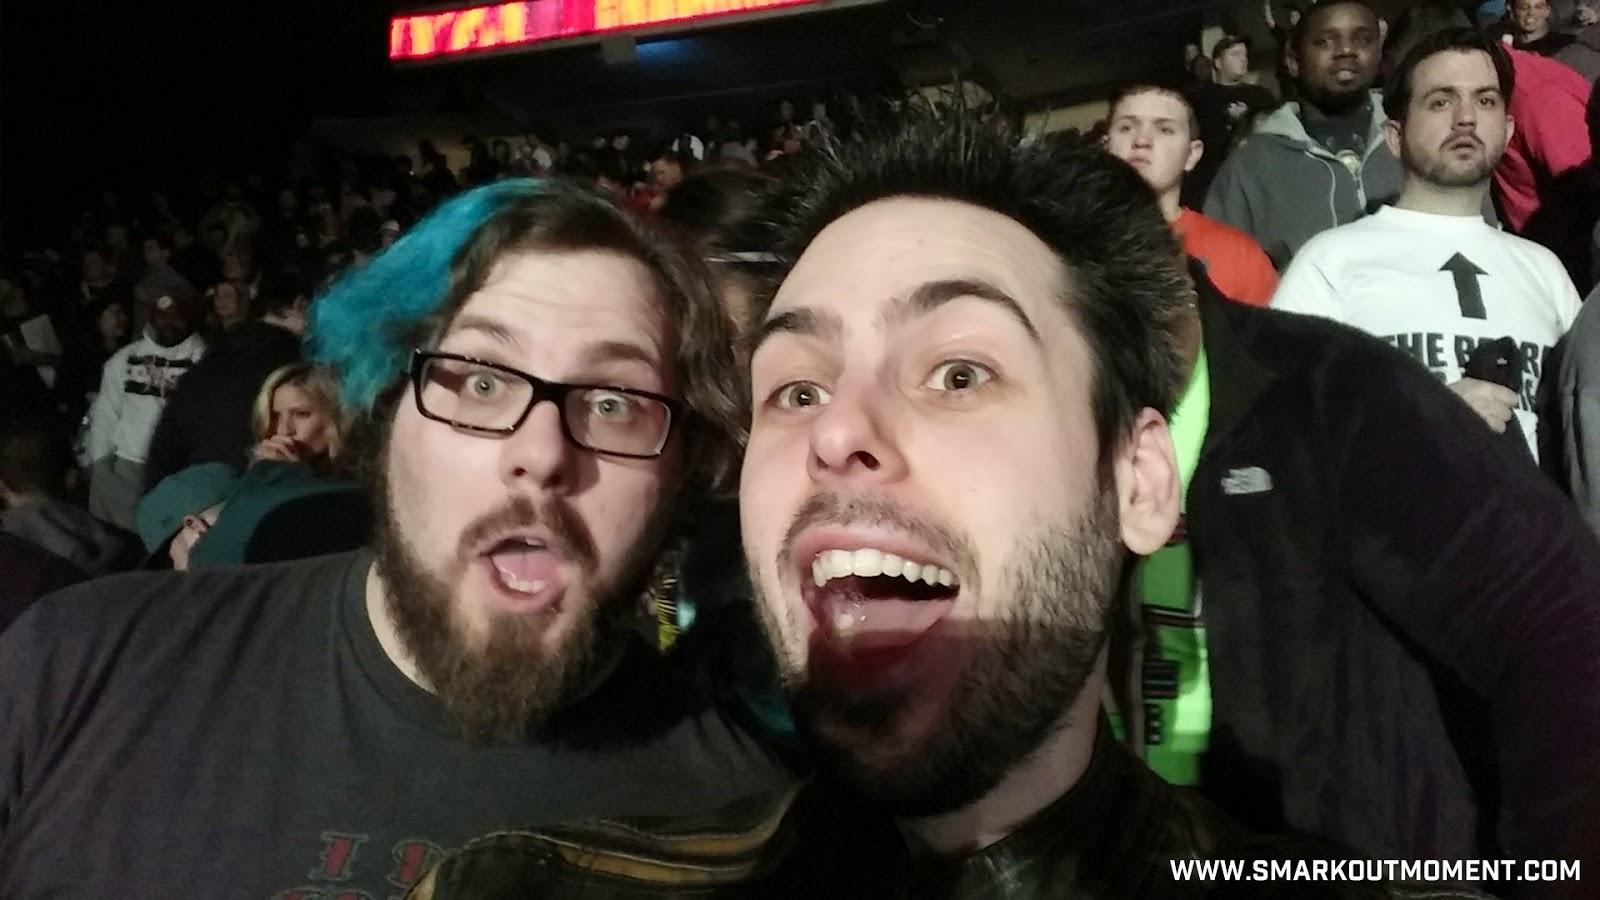 WWE Royal Rumble 2015 photos